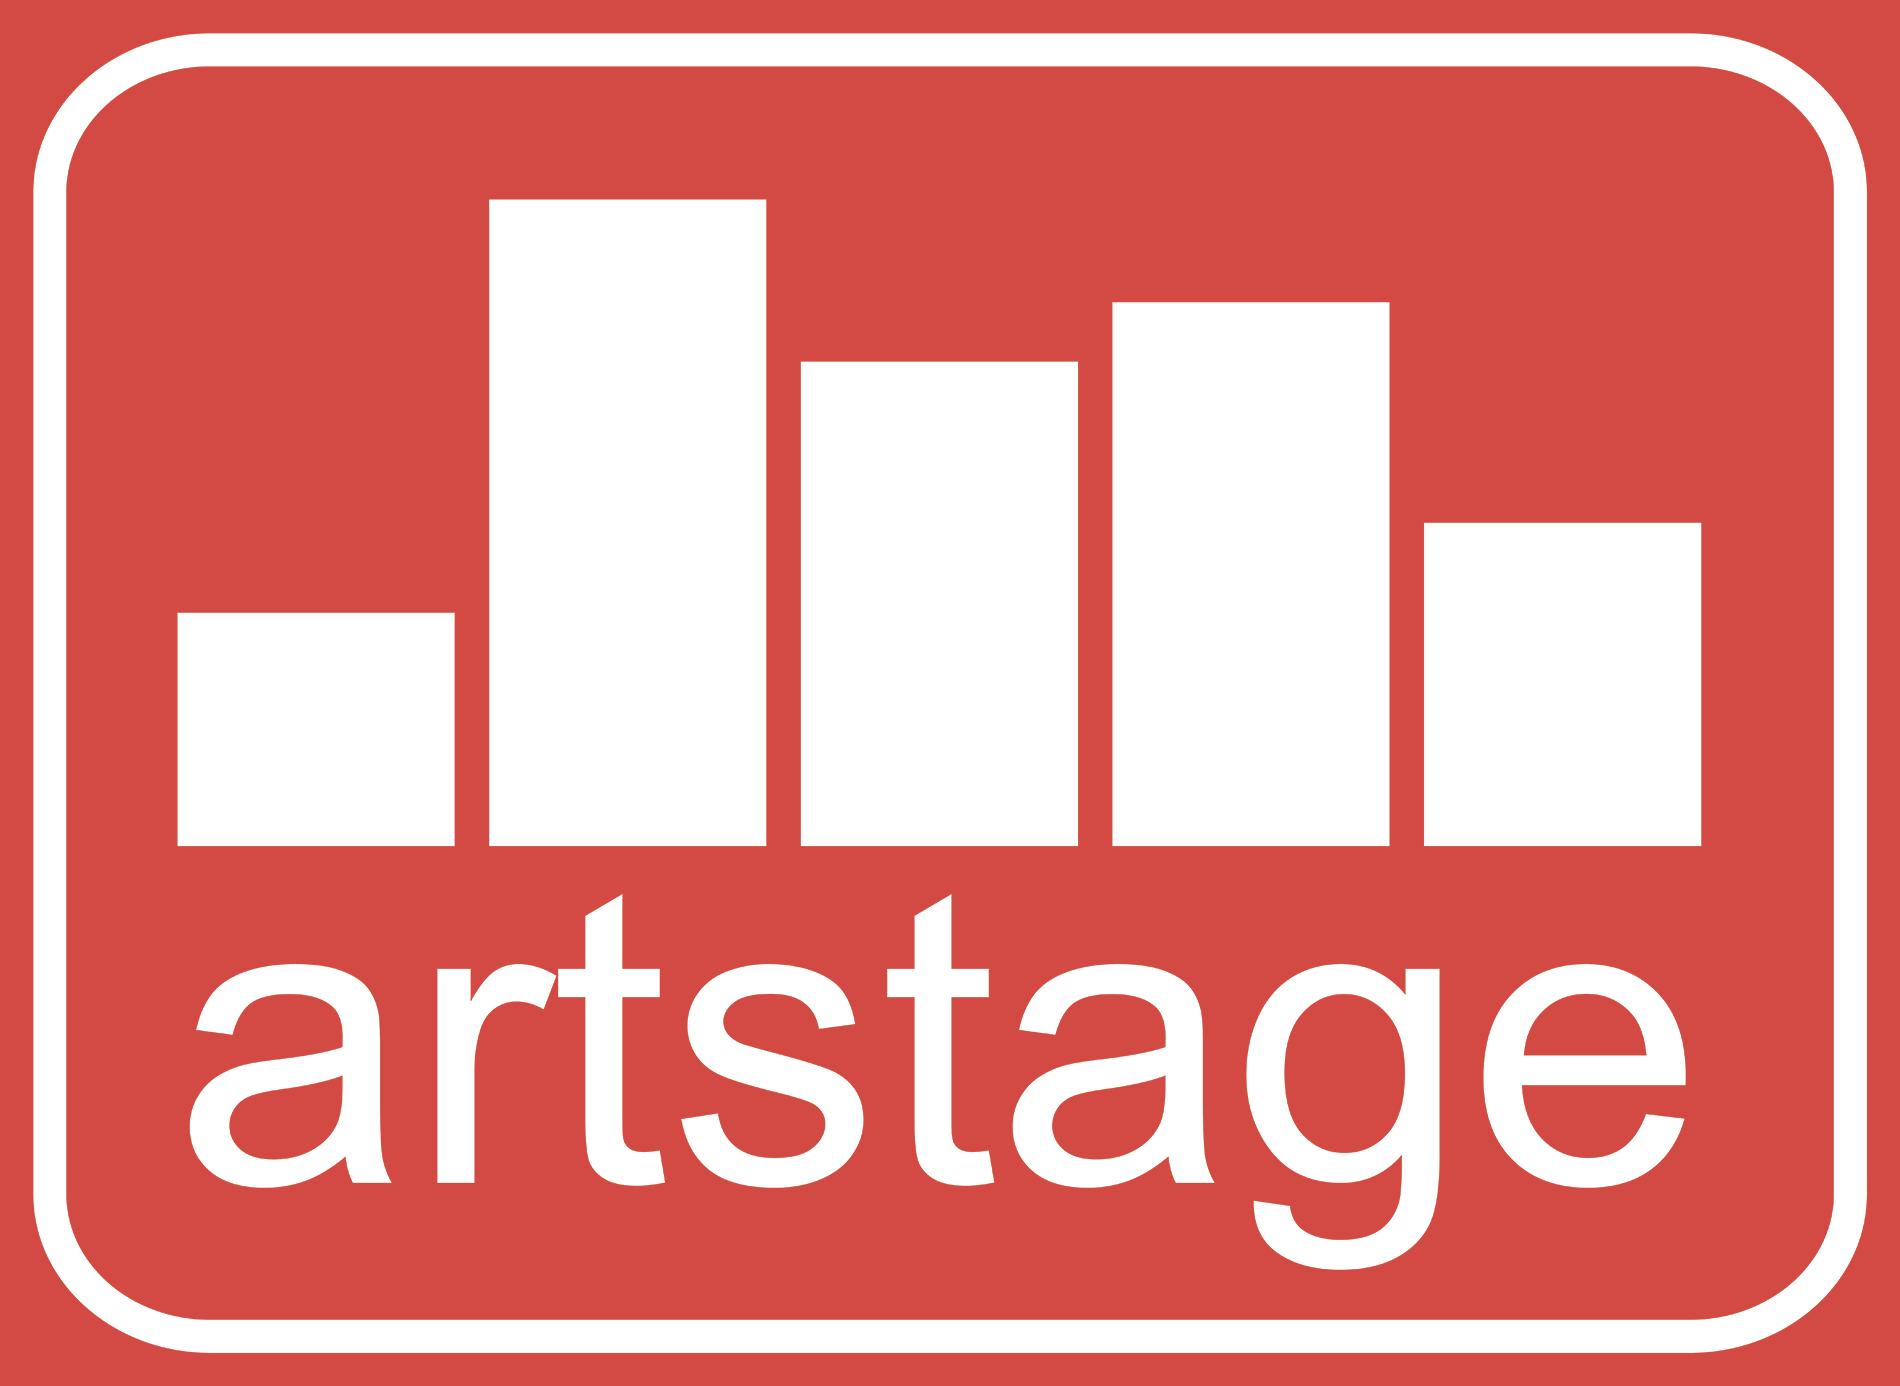 ArtStage аренда студийного оборудования